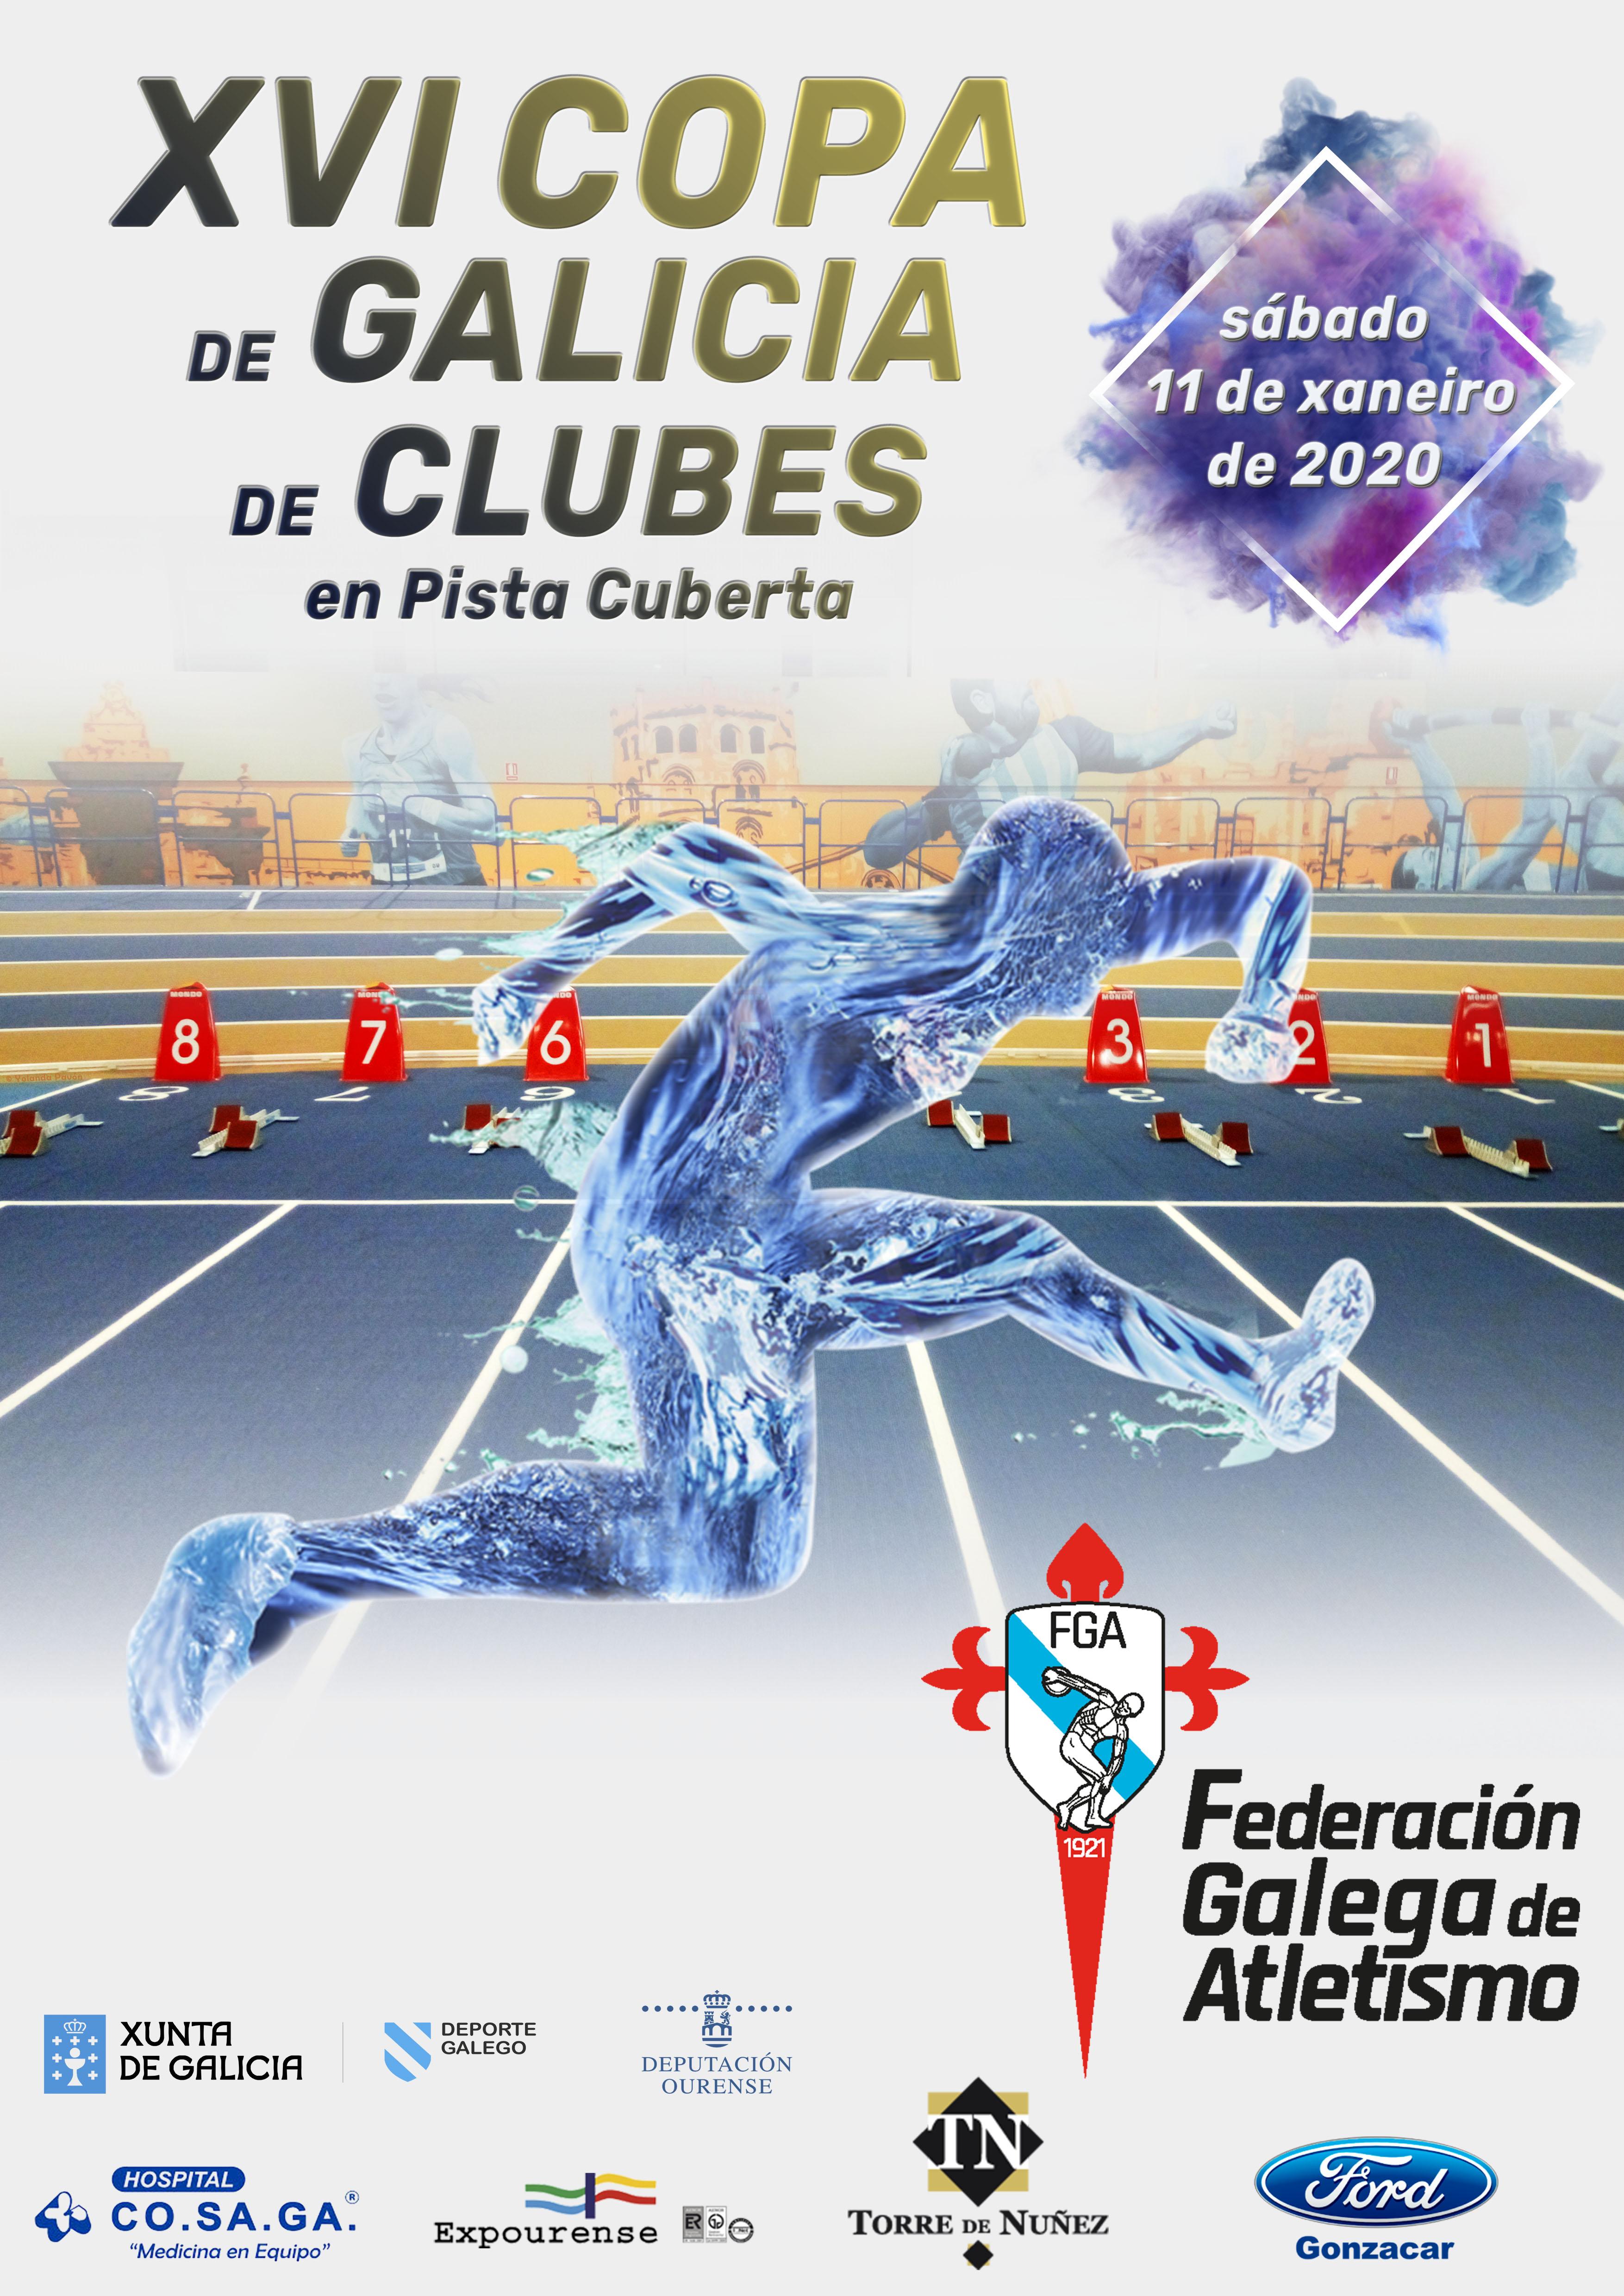 XVI Copa de Galicia de Clubs en Pista Cuberta